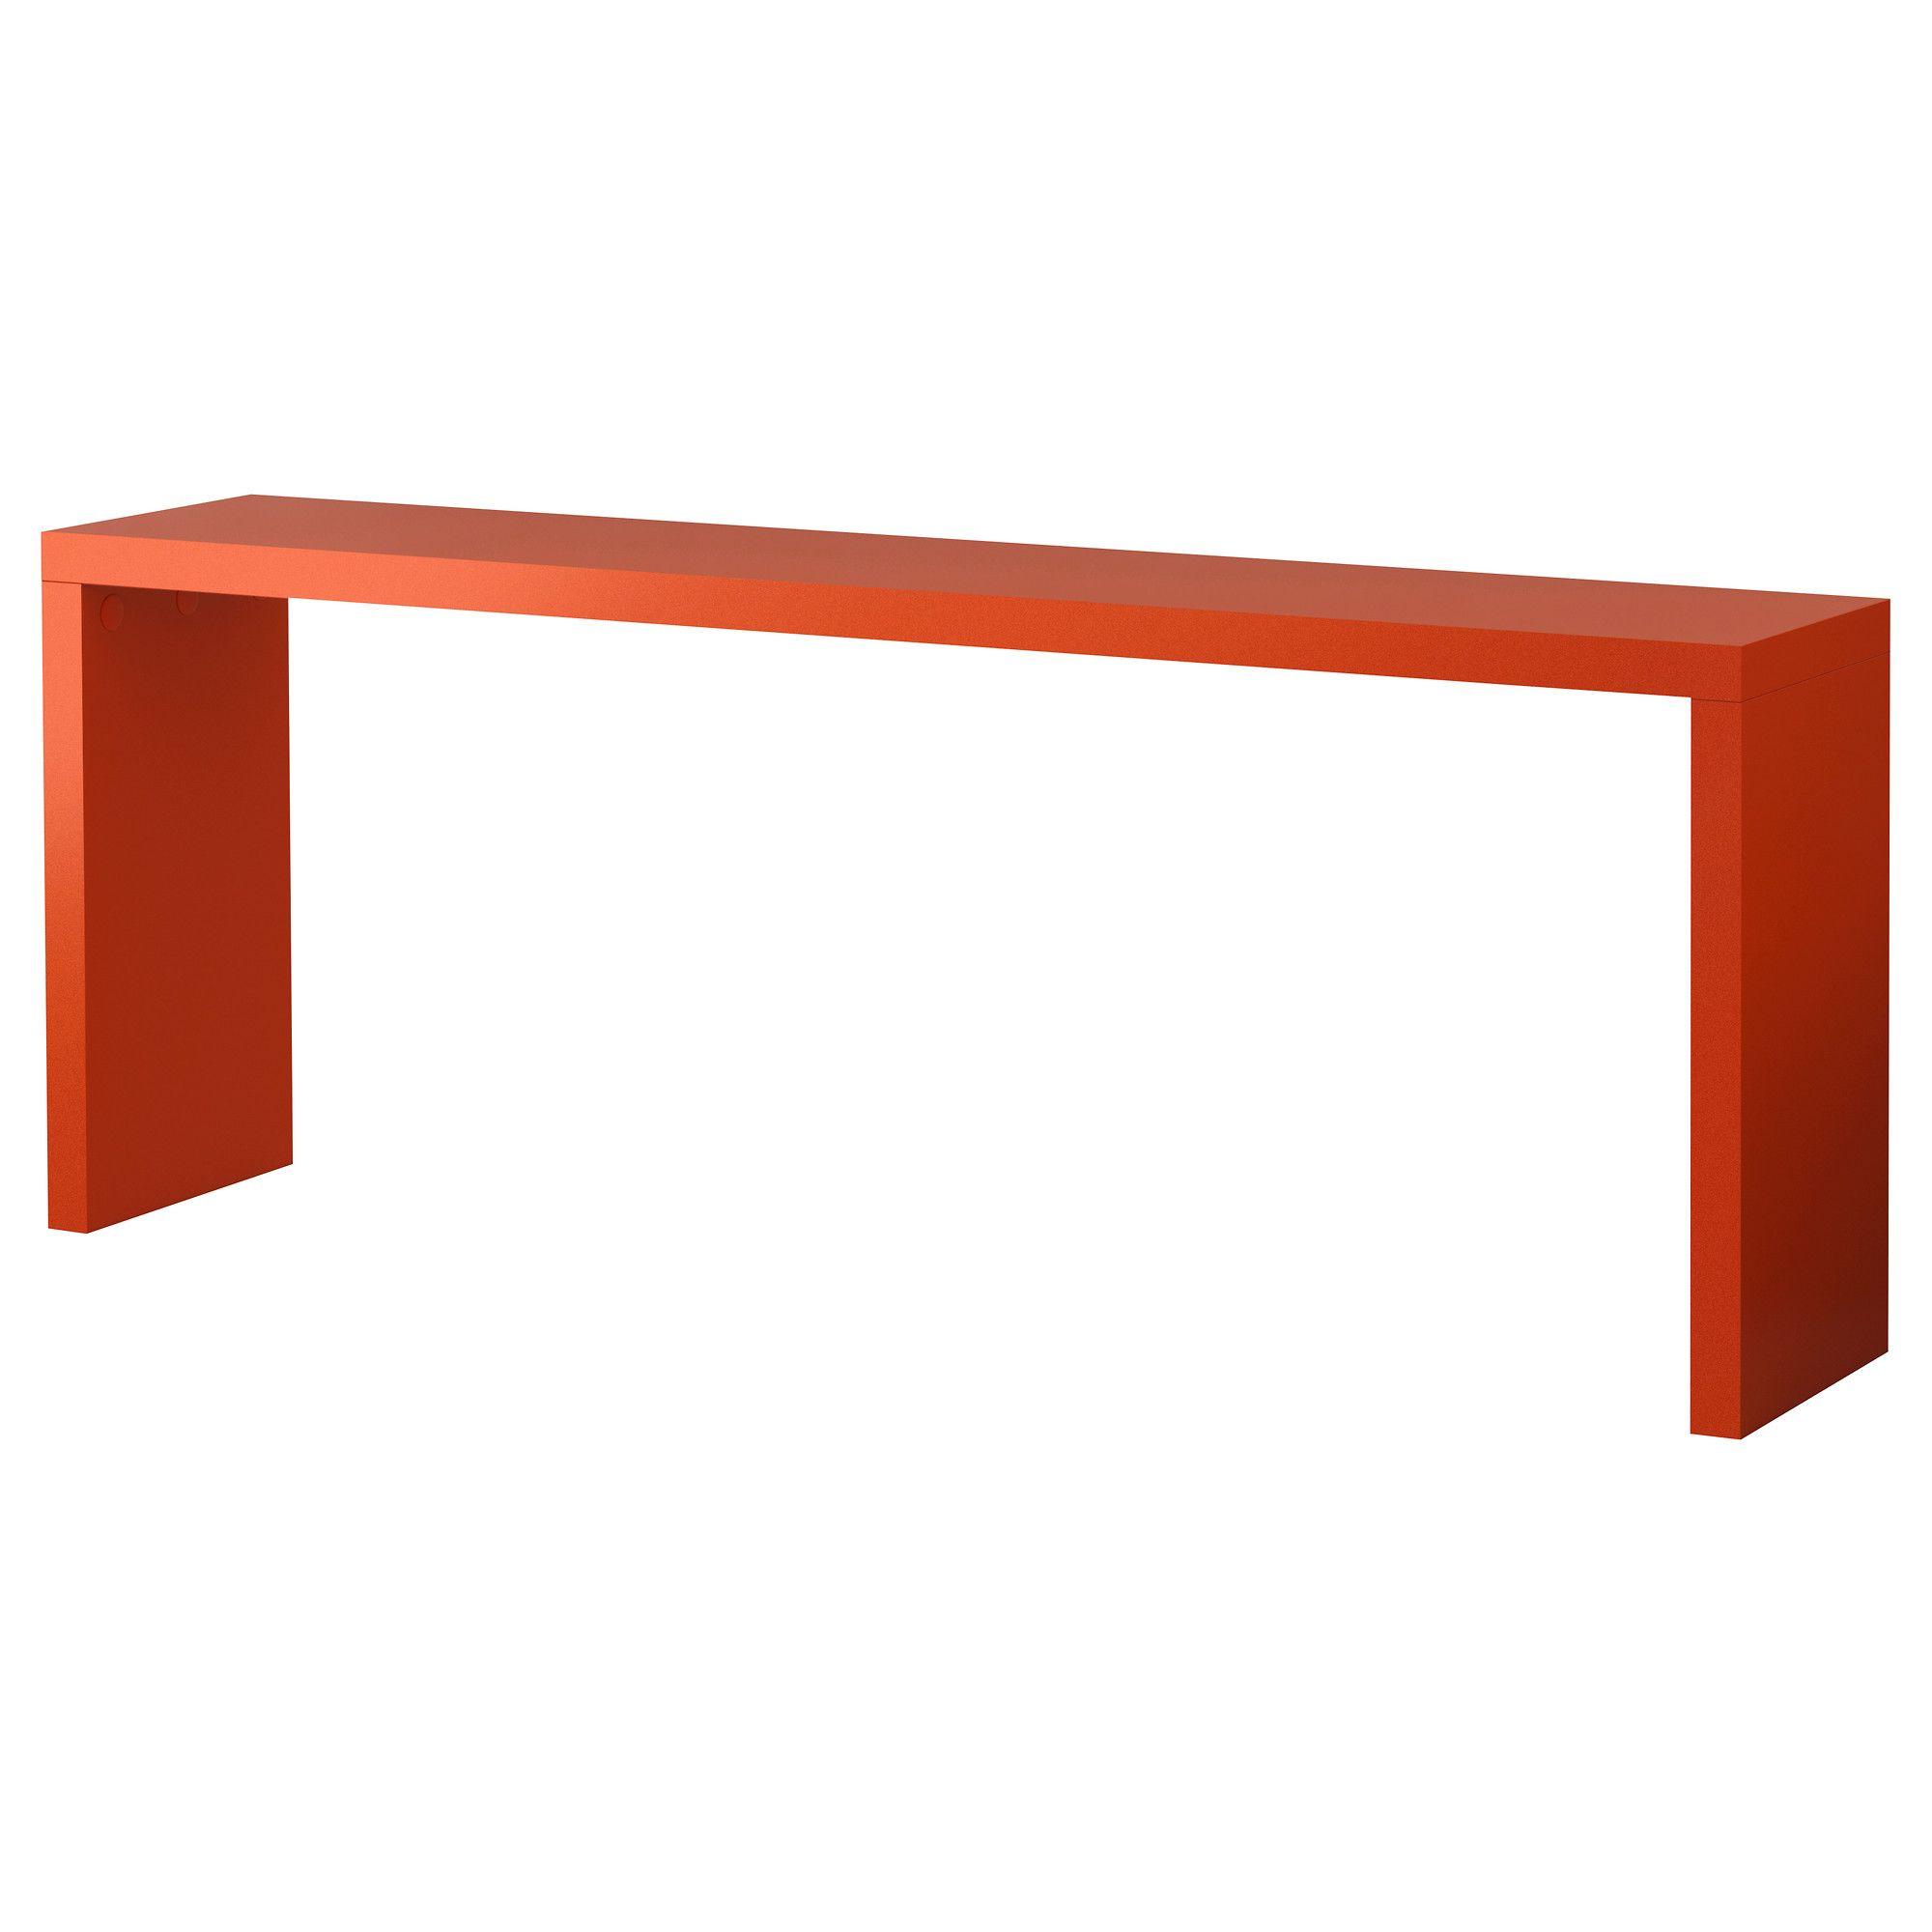 Us Furniture And Home Furnishings Malm Occasional Table Ikea Finds Ikea